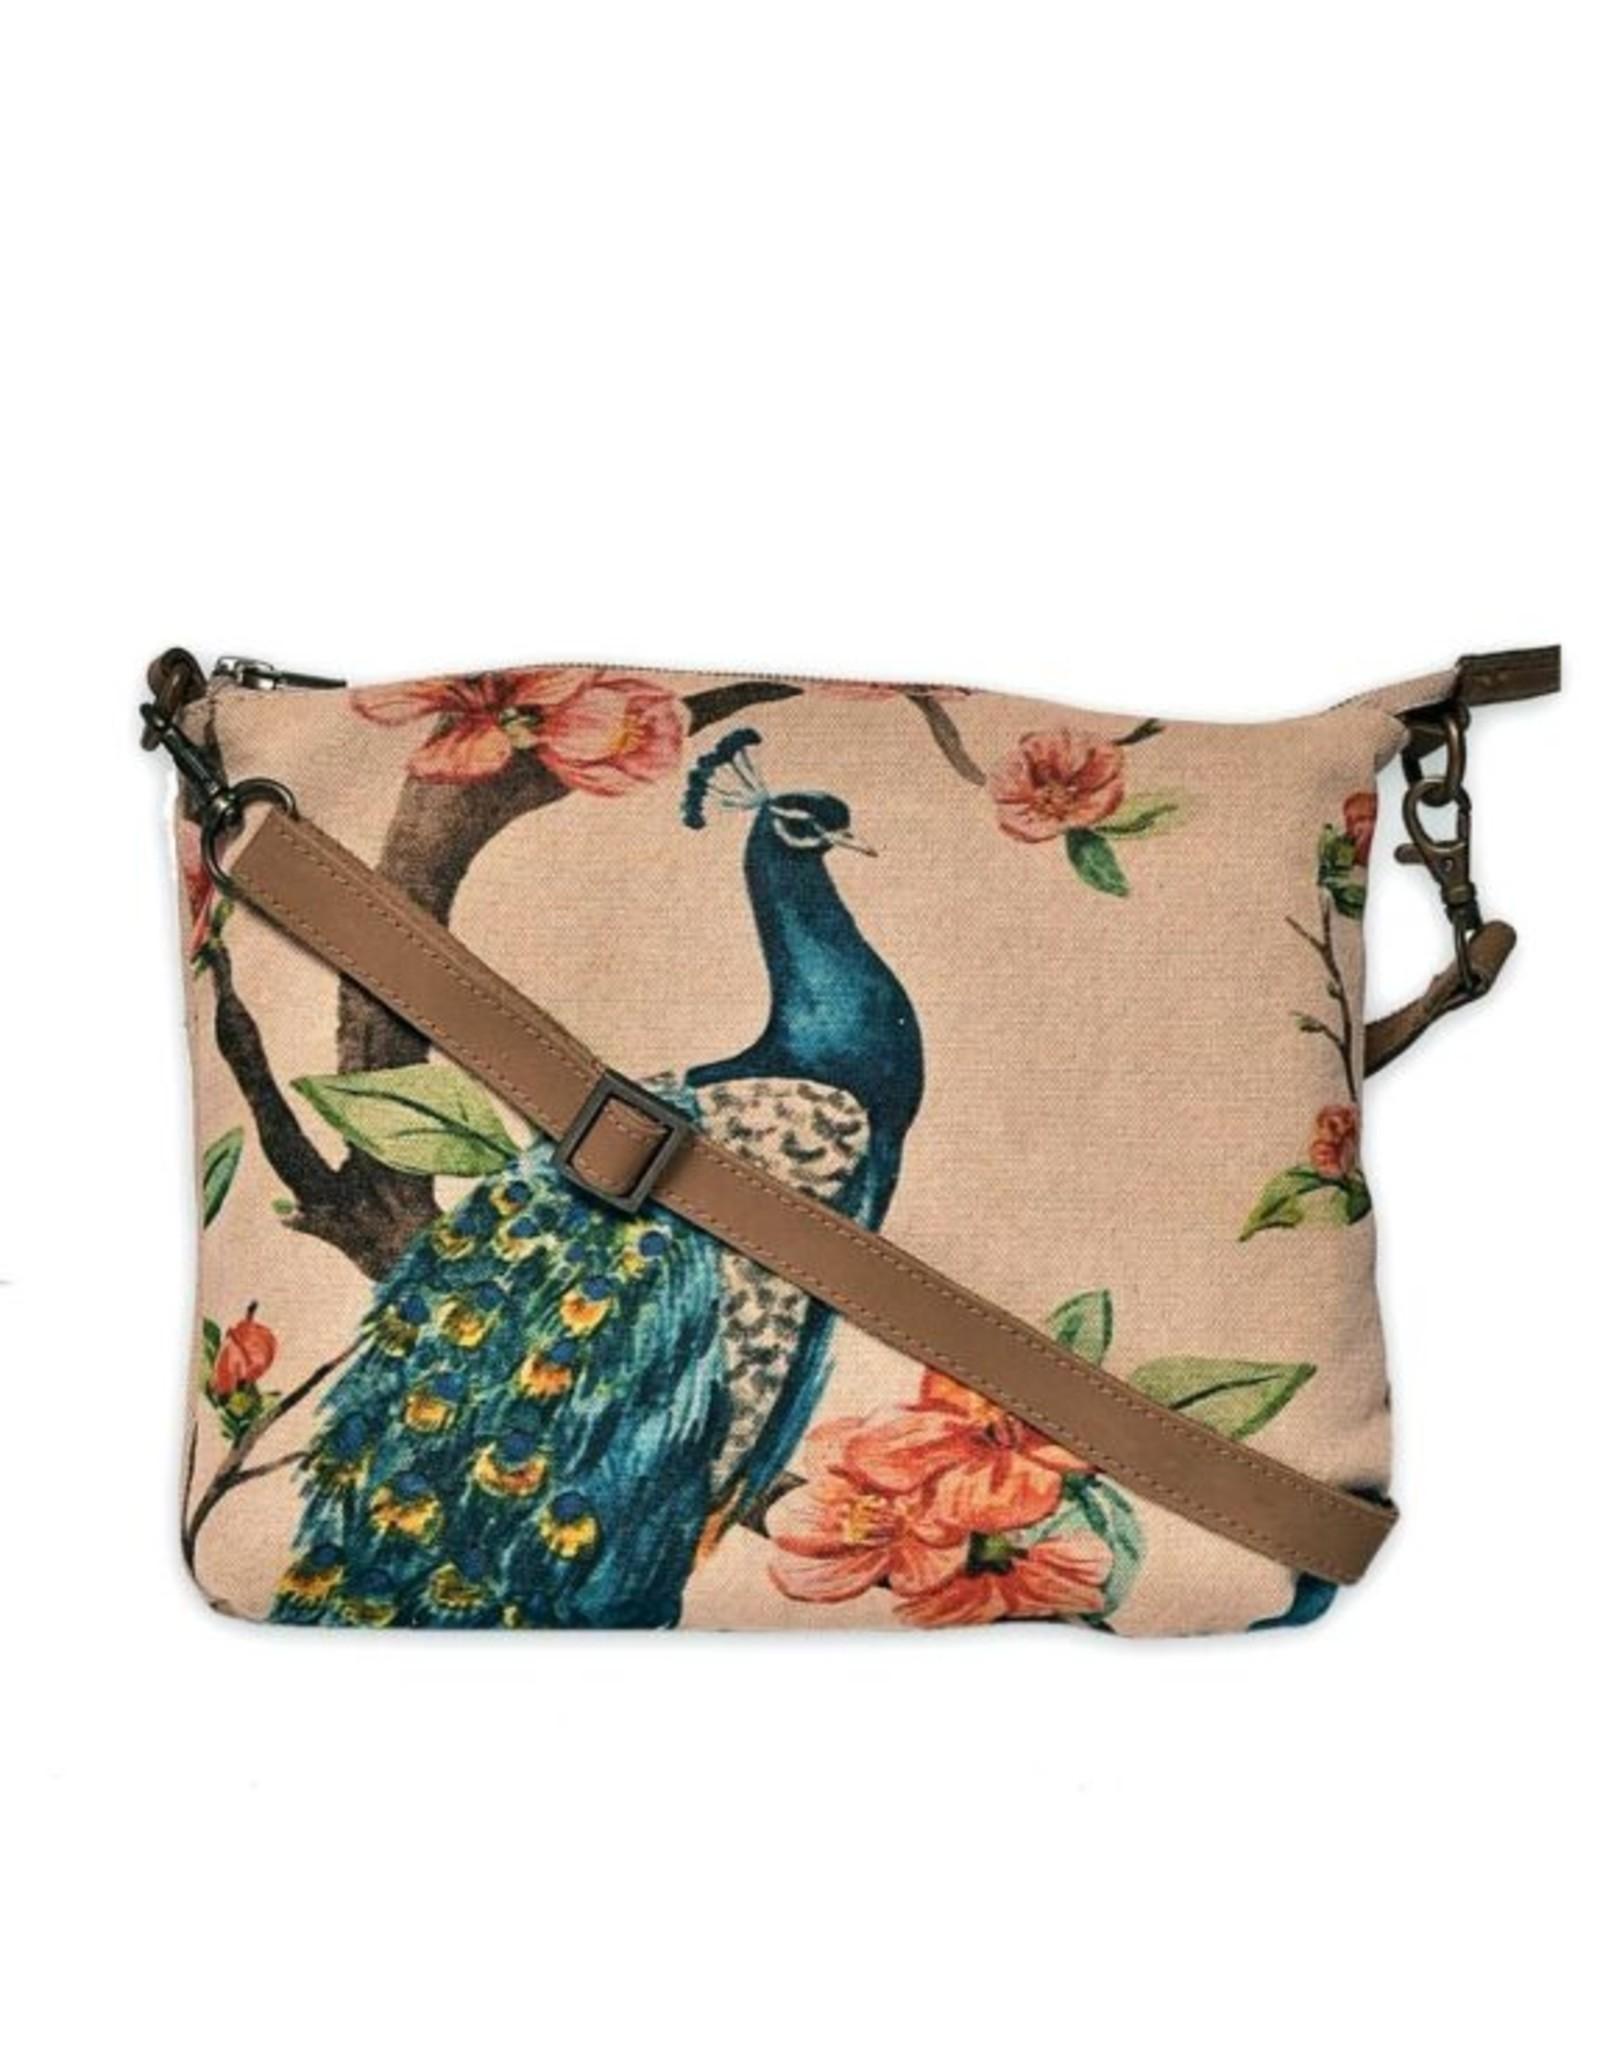 CottnCurls Sling Bag, Peacock